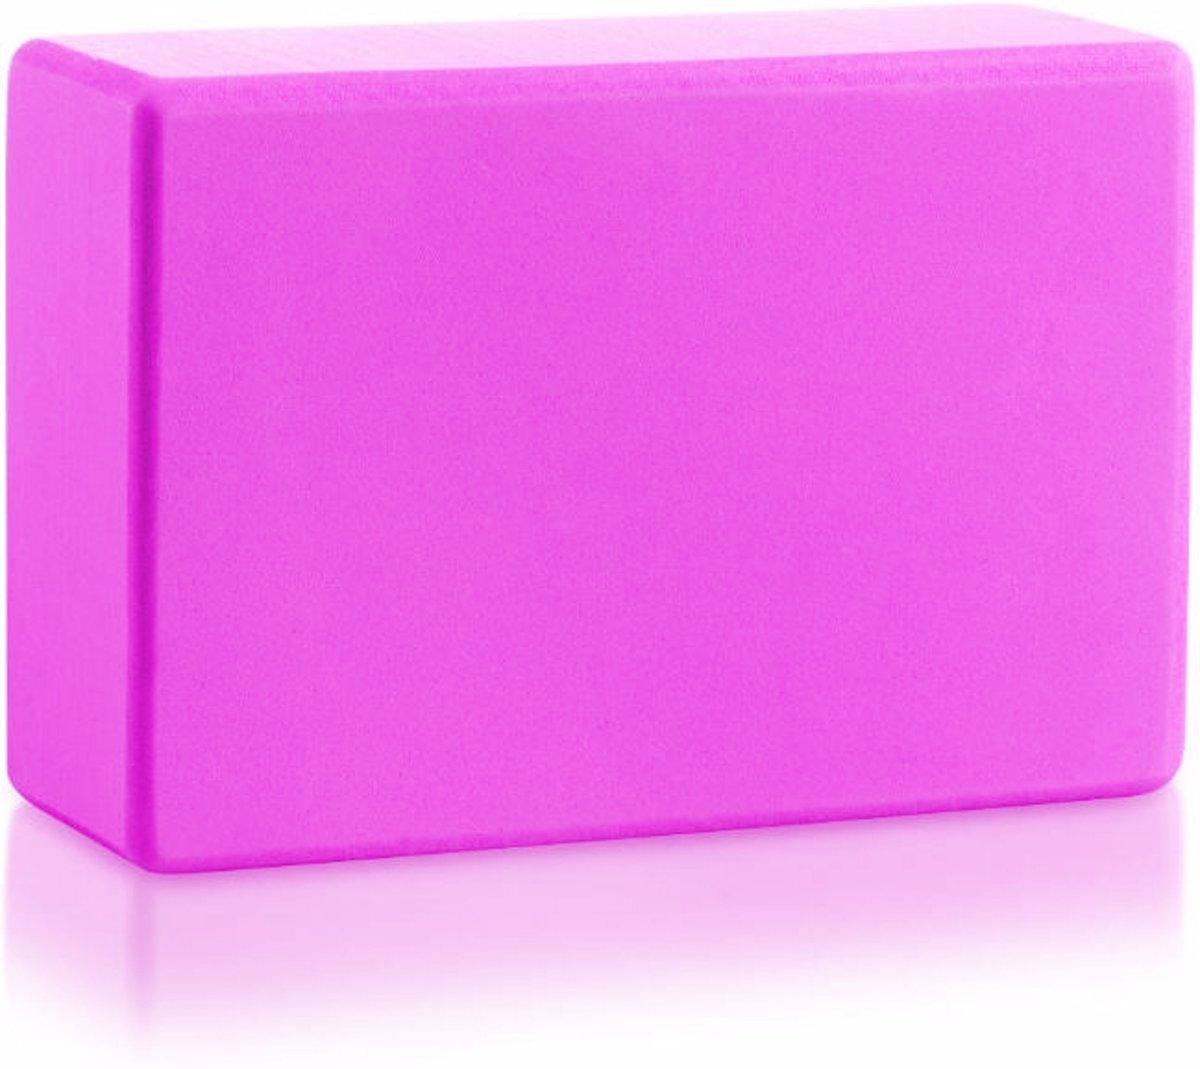 JAP Yoga blok - Foam [Pro Series] - Verbetert kracht balans en flexibiliteit - 23x15x8cm - 200g - Roze